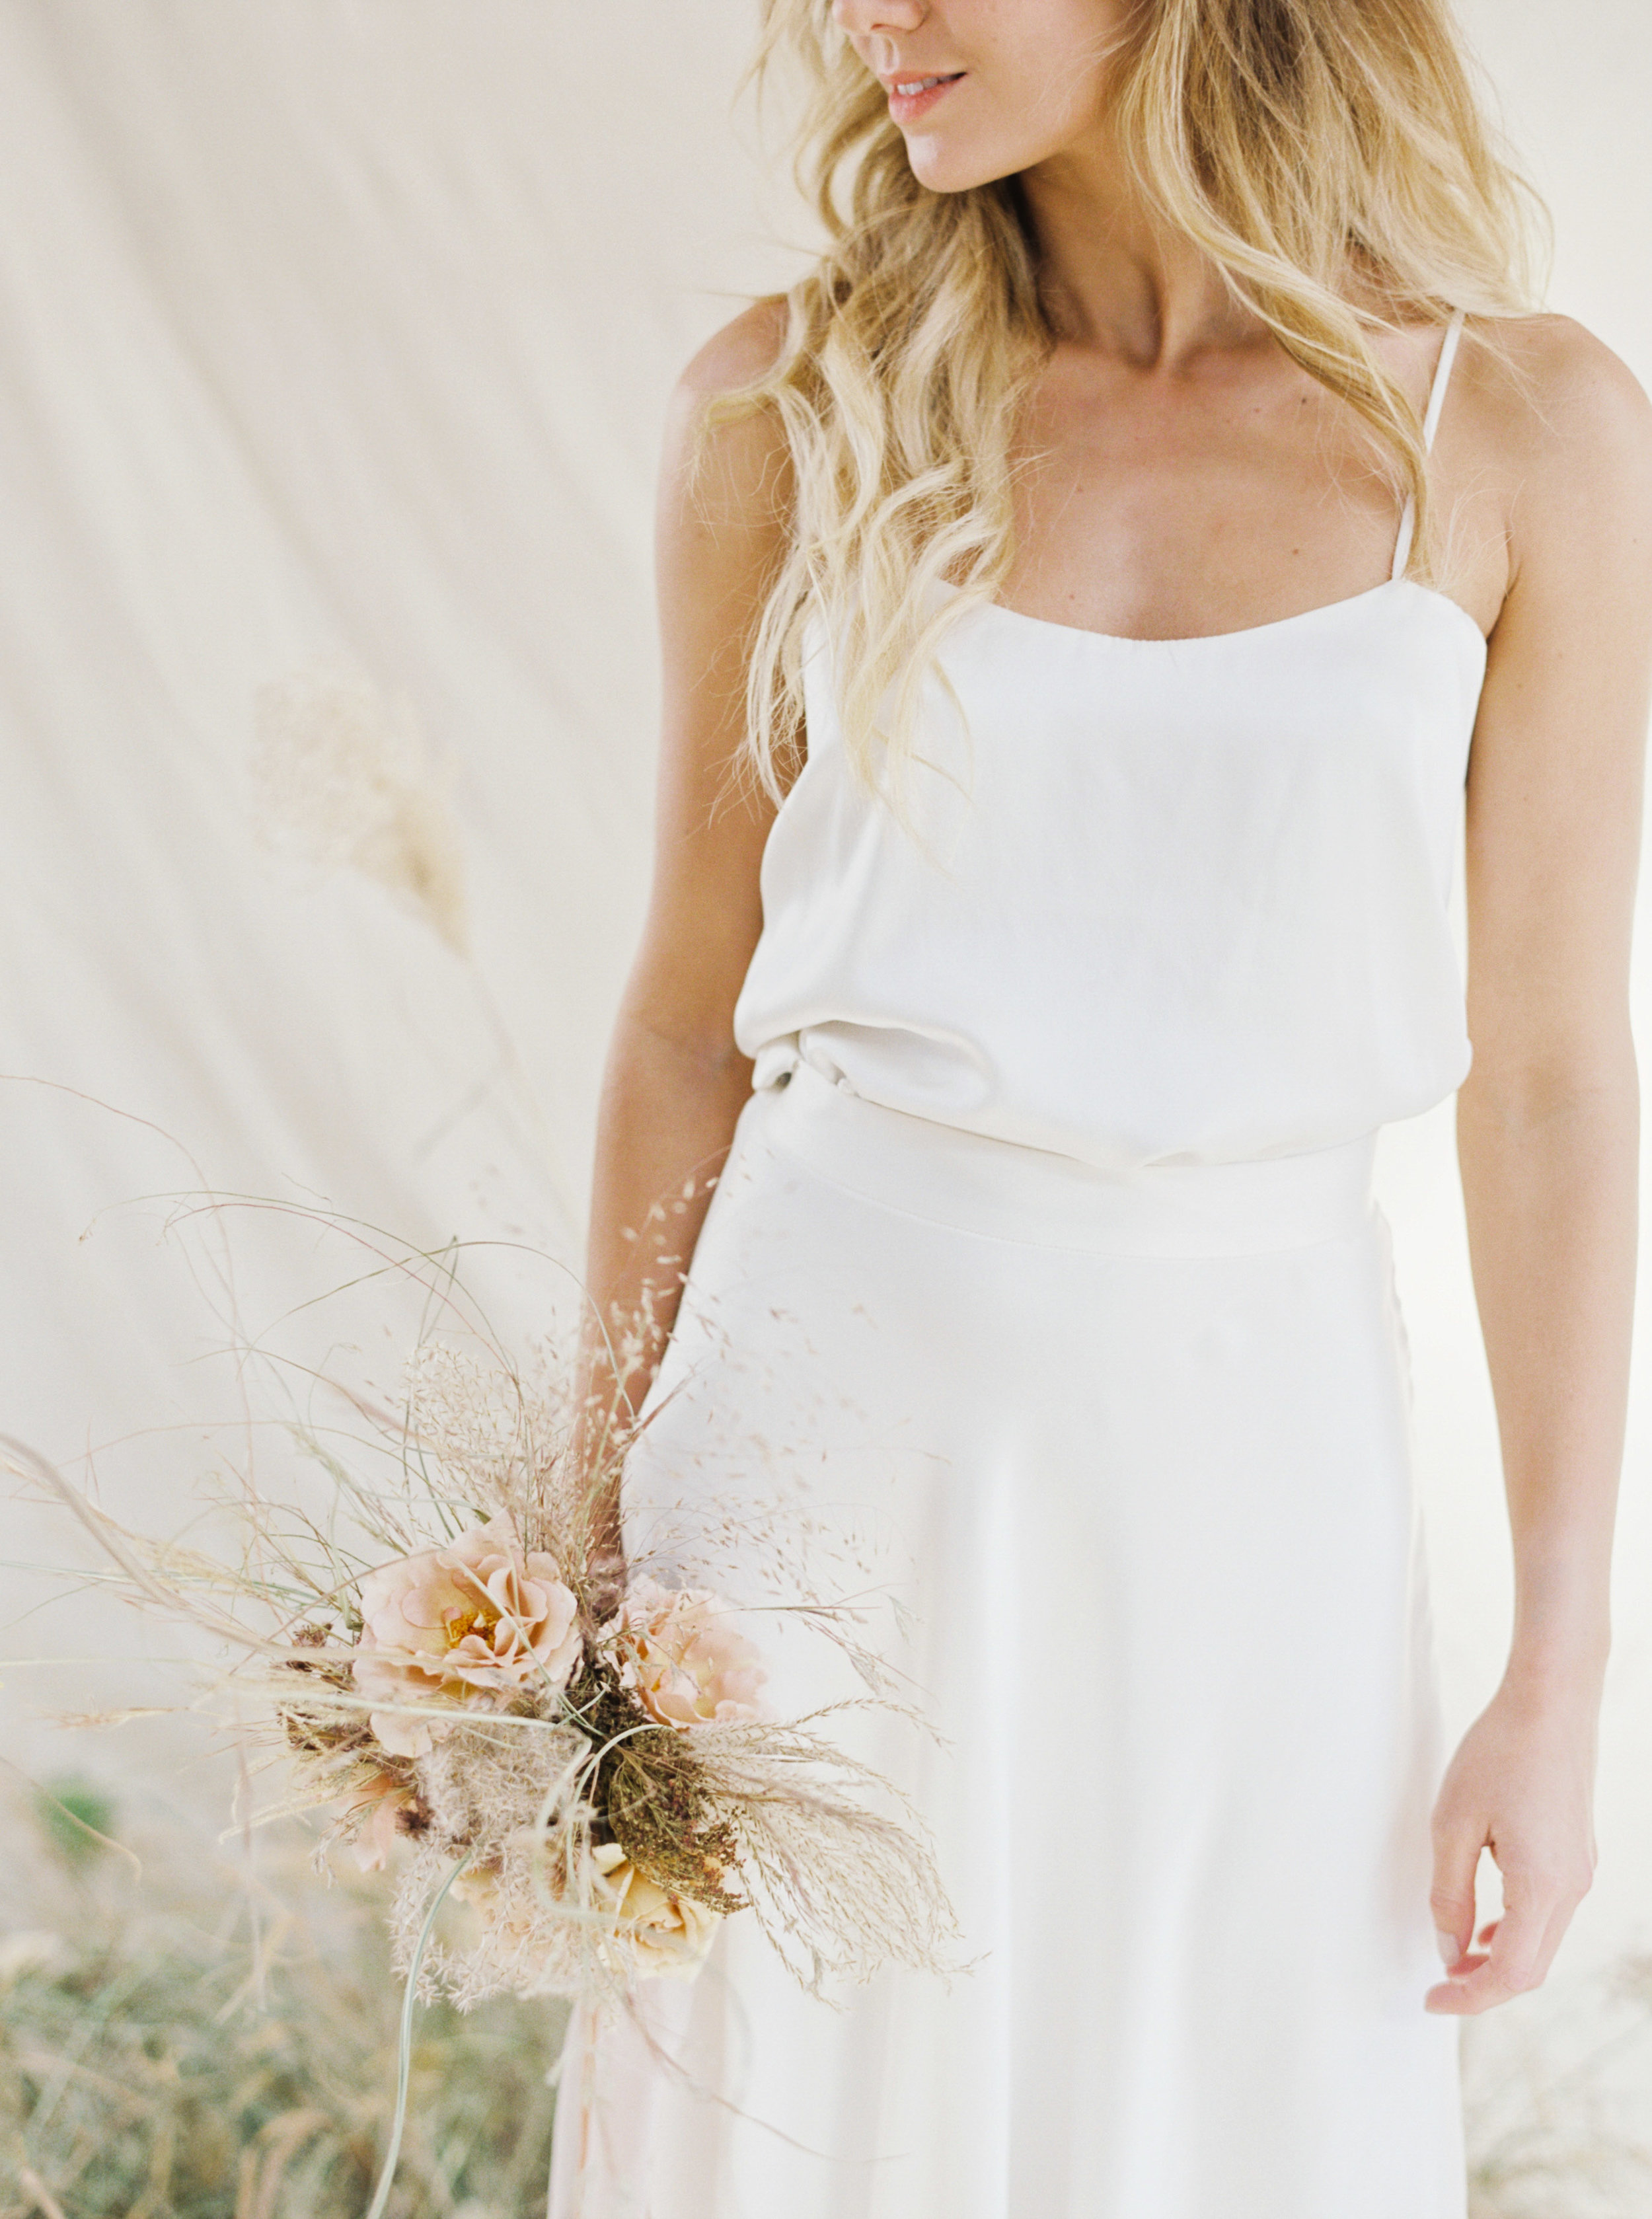 Copy of Sheri McMahon Fine Art Film NSW Sydney Bowral Wedding Photographer - Sydney Bride in wedding gown by Hope X Page